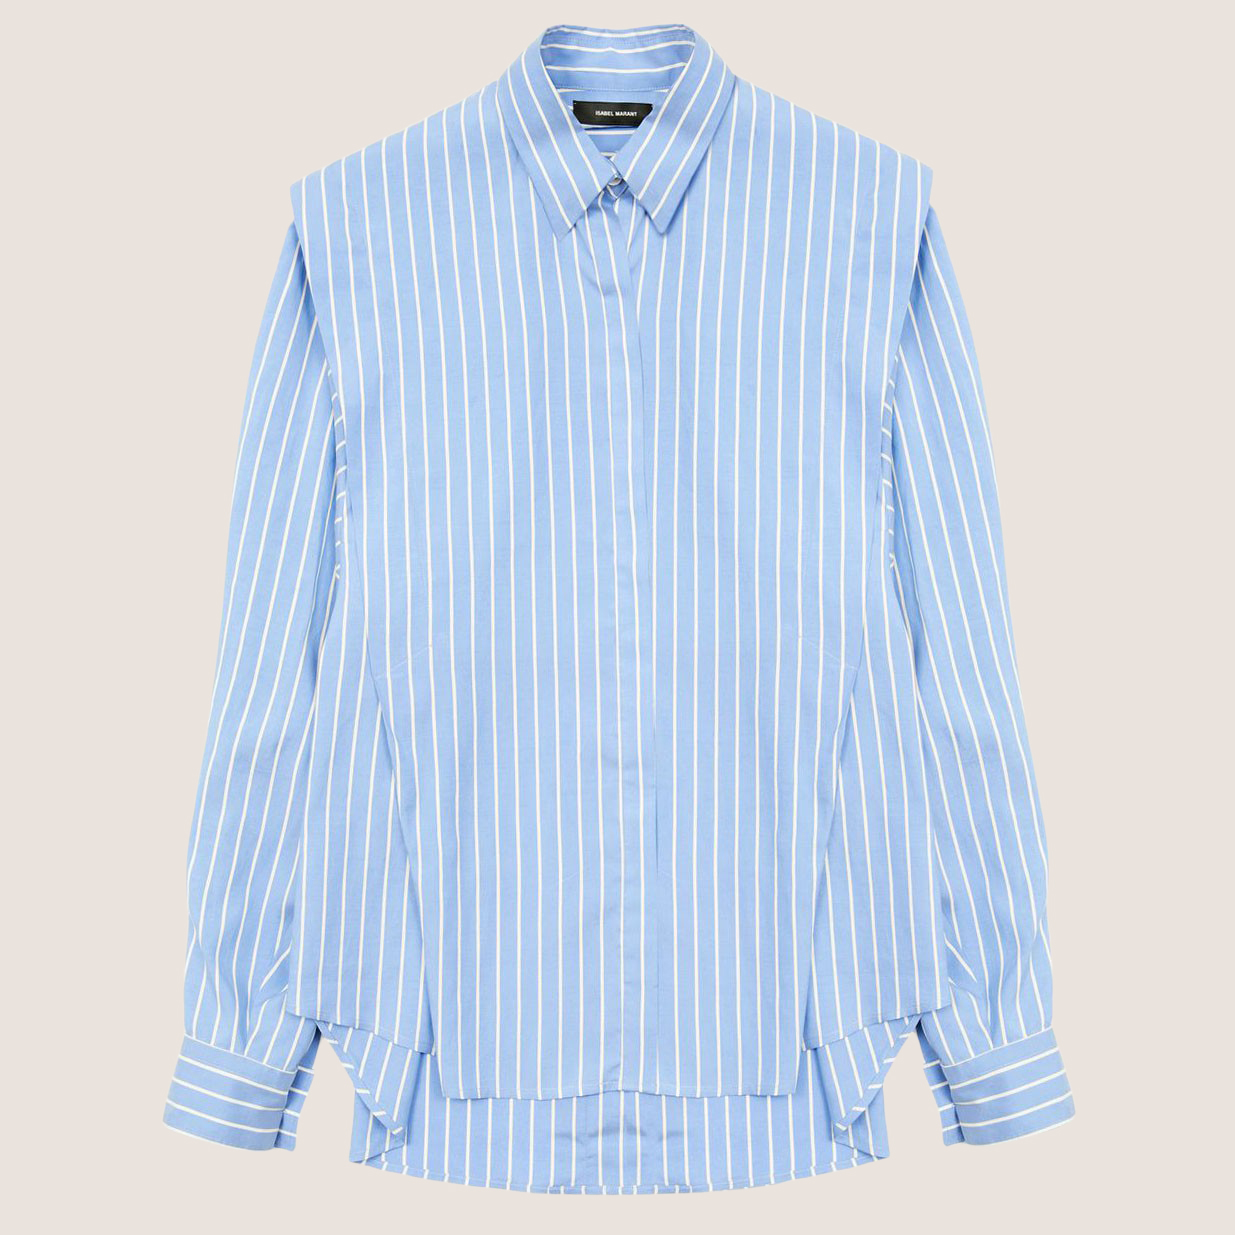 Sotalki Shirt